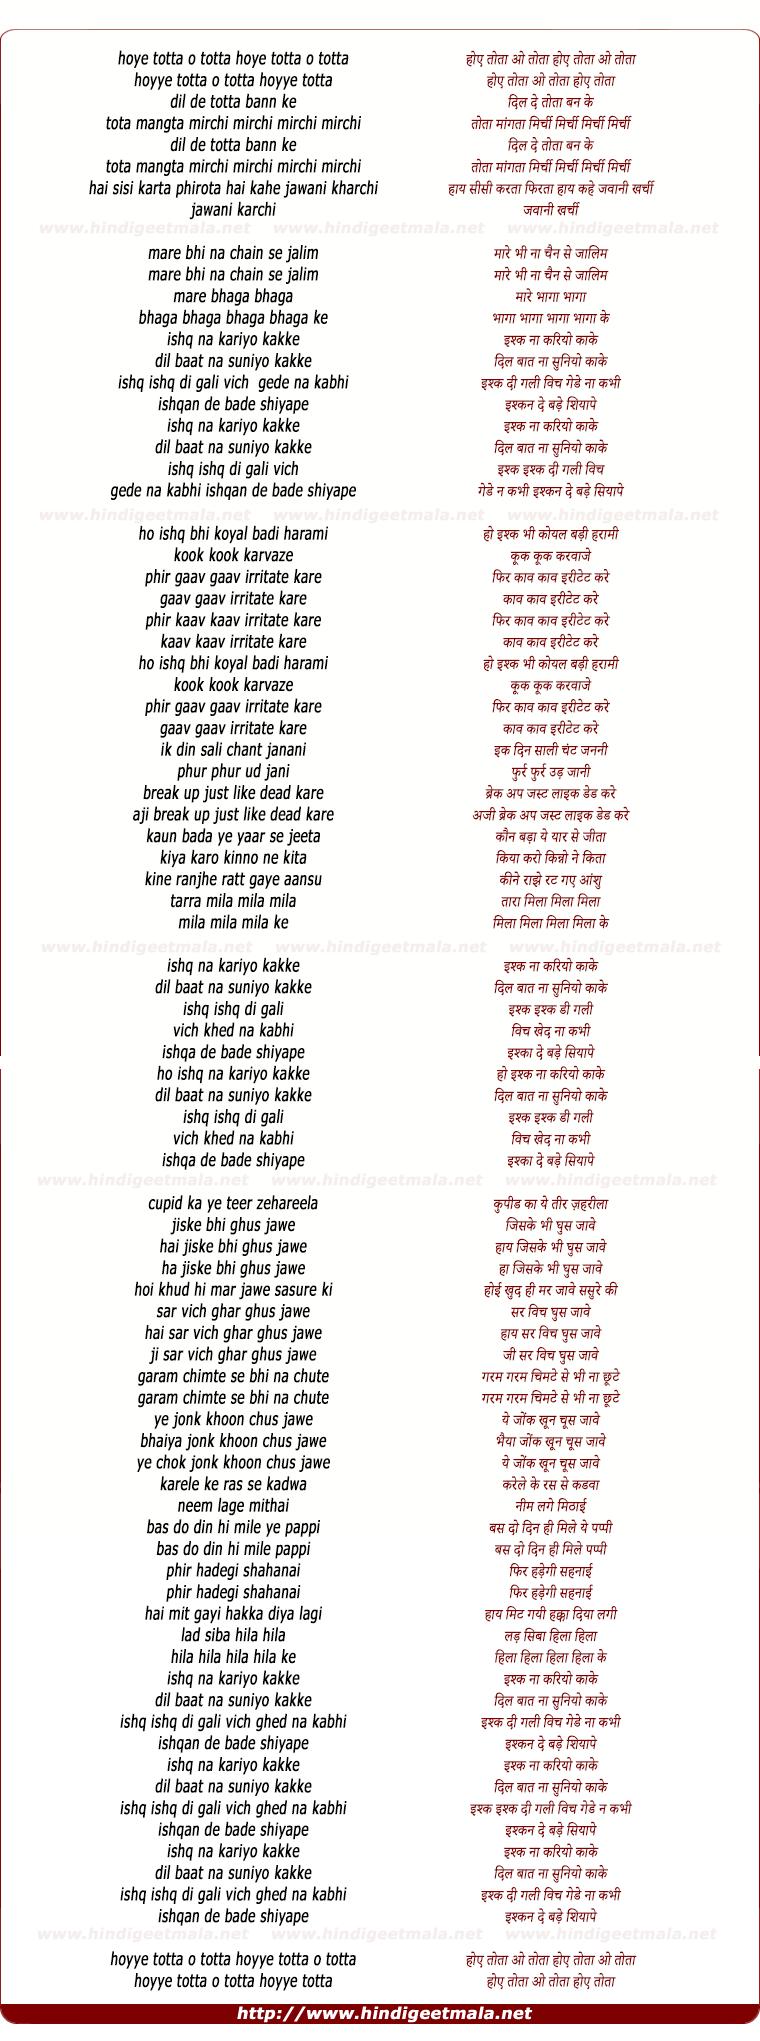 lyrics of song Ishq Naa Kariyo Kake